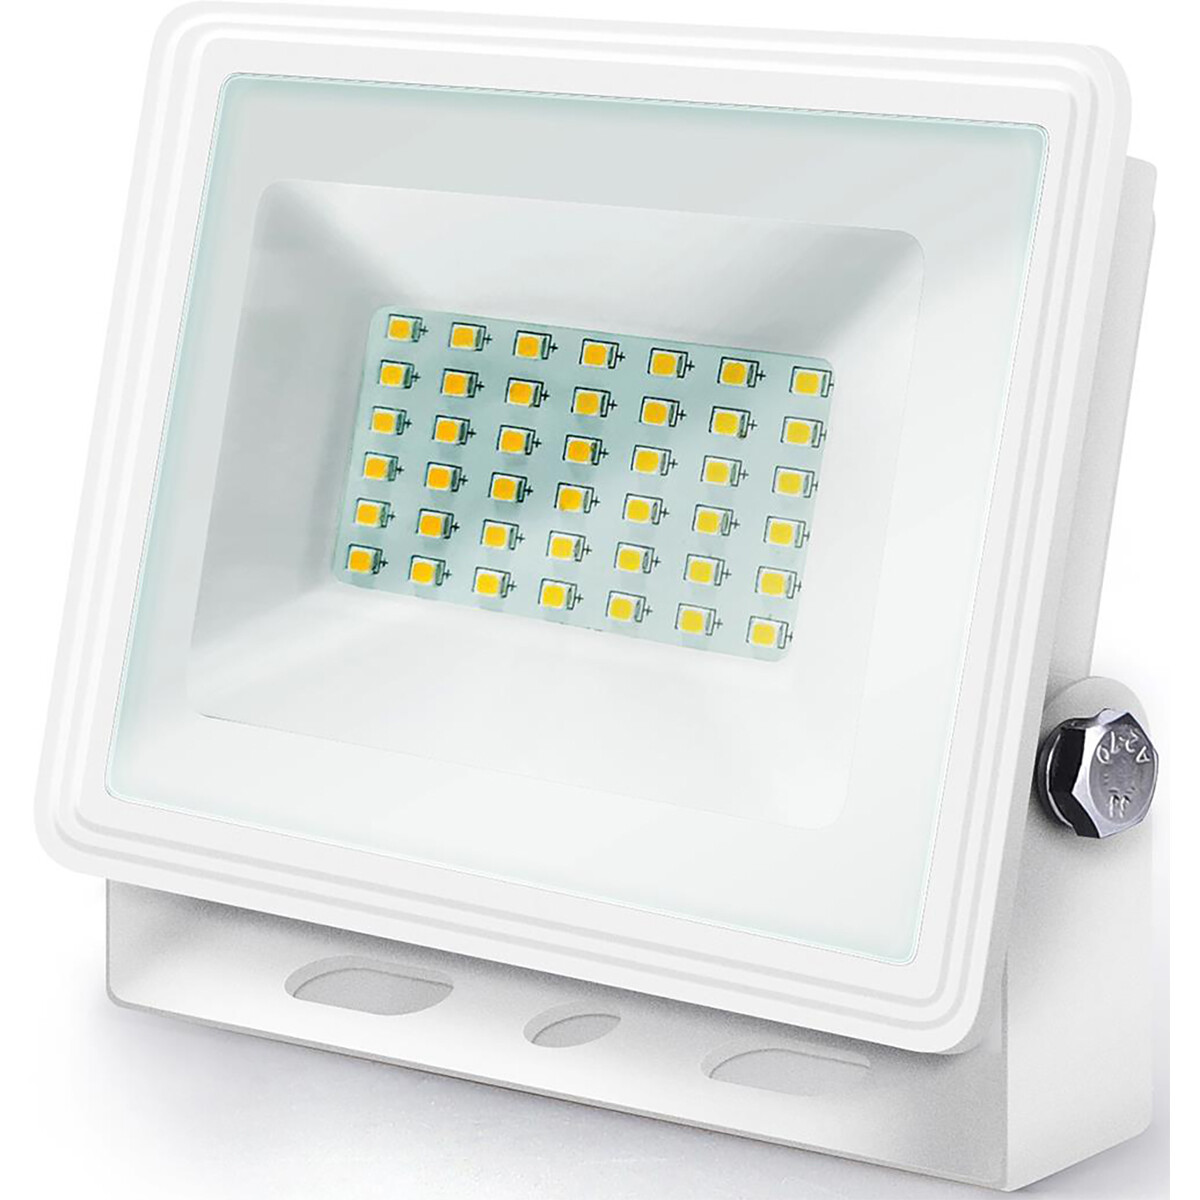 LED Bouwlamp 30 Watt - LED Schijnwerper - Aigi Iglo - Natuurlijk Wit 4000K - Waterdicht IP65 - Mat W